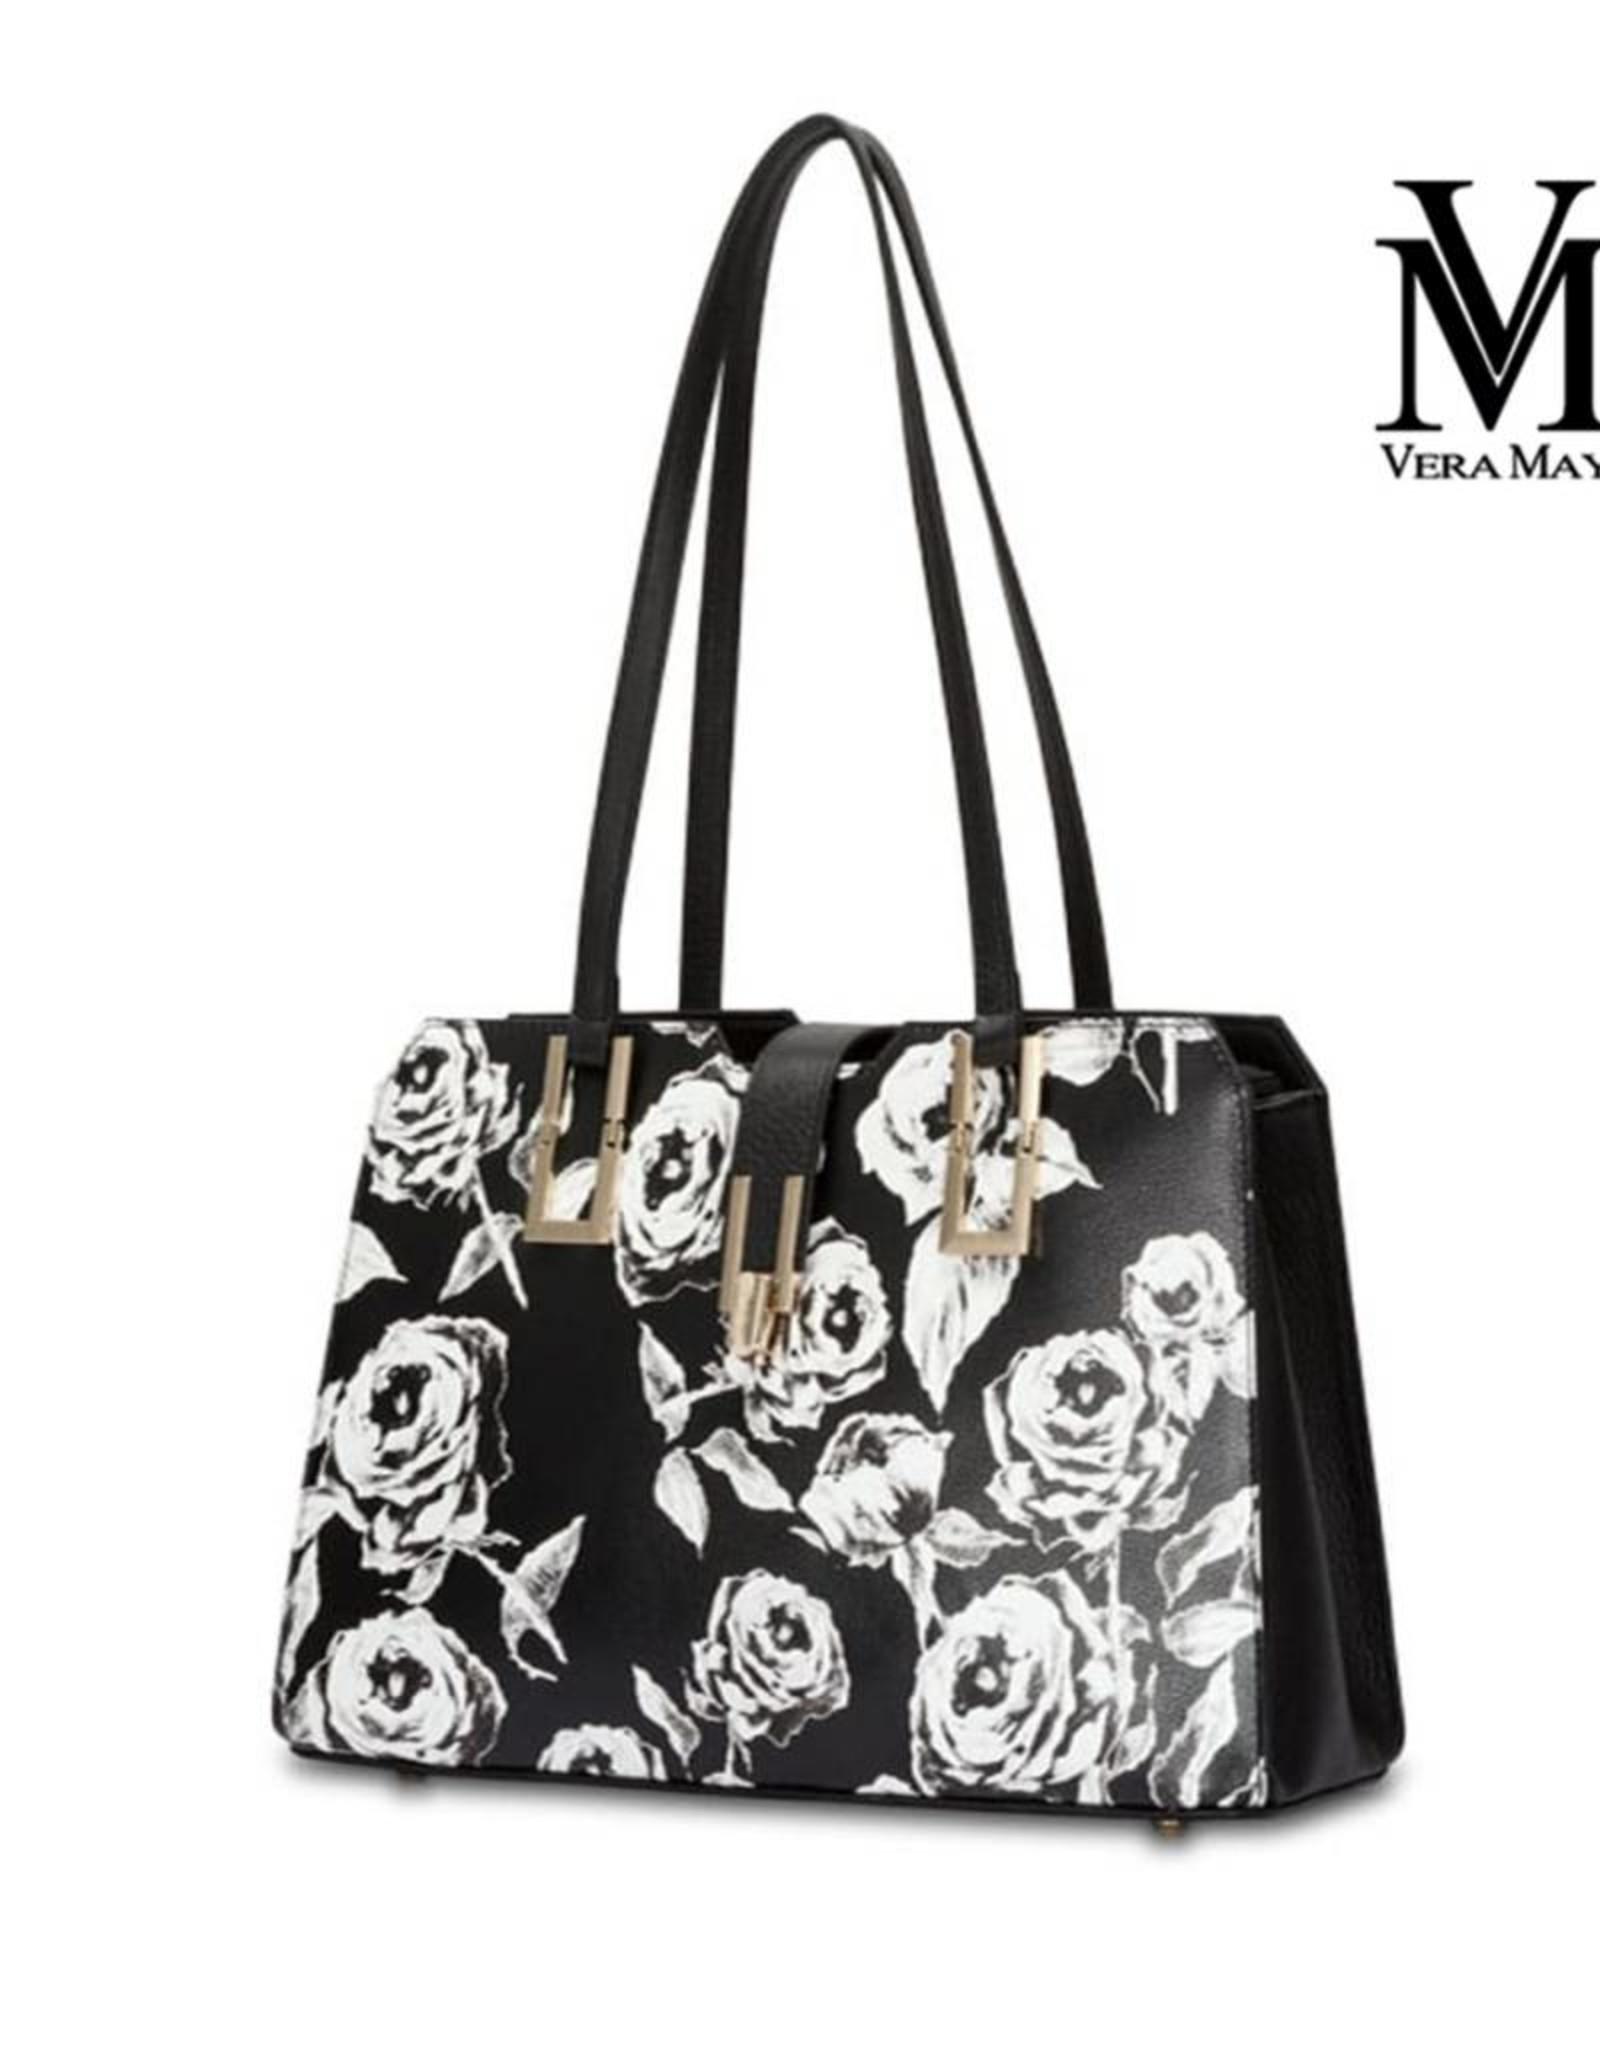 Vera May Sage Handbag